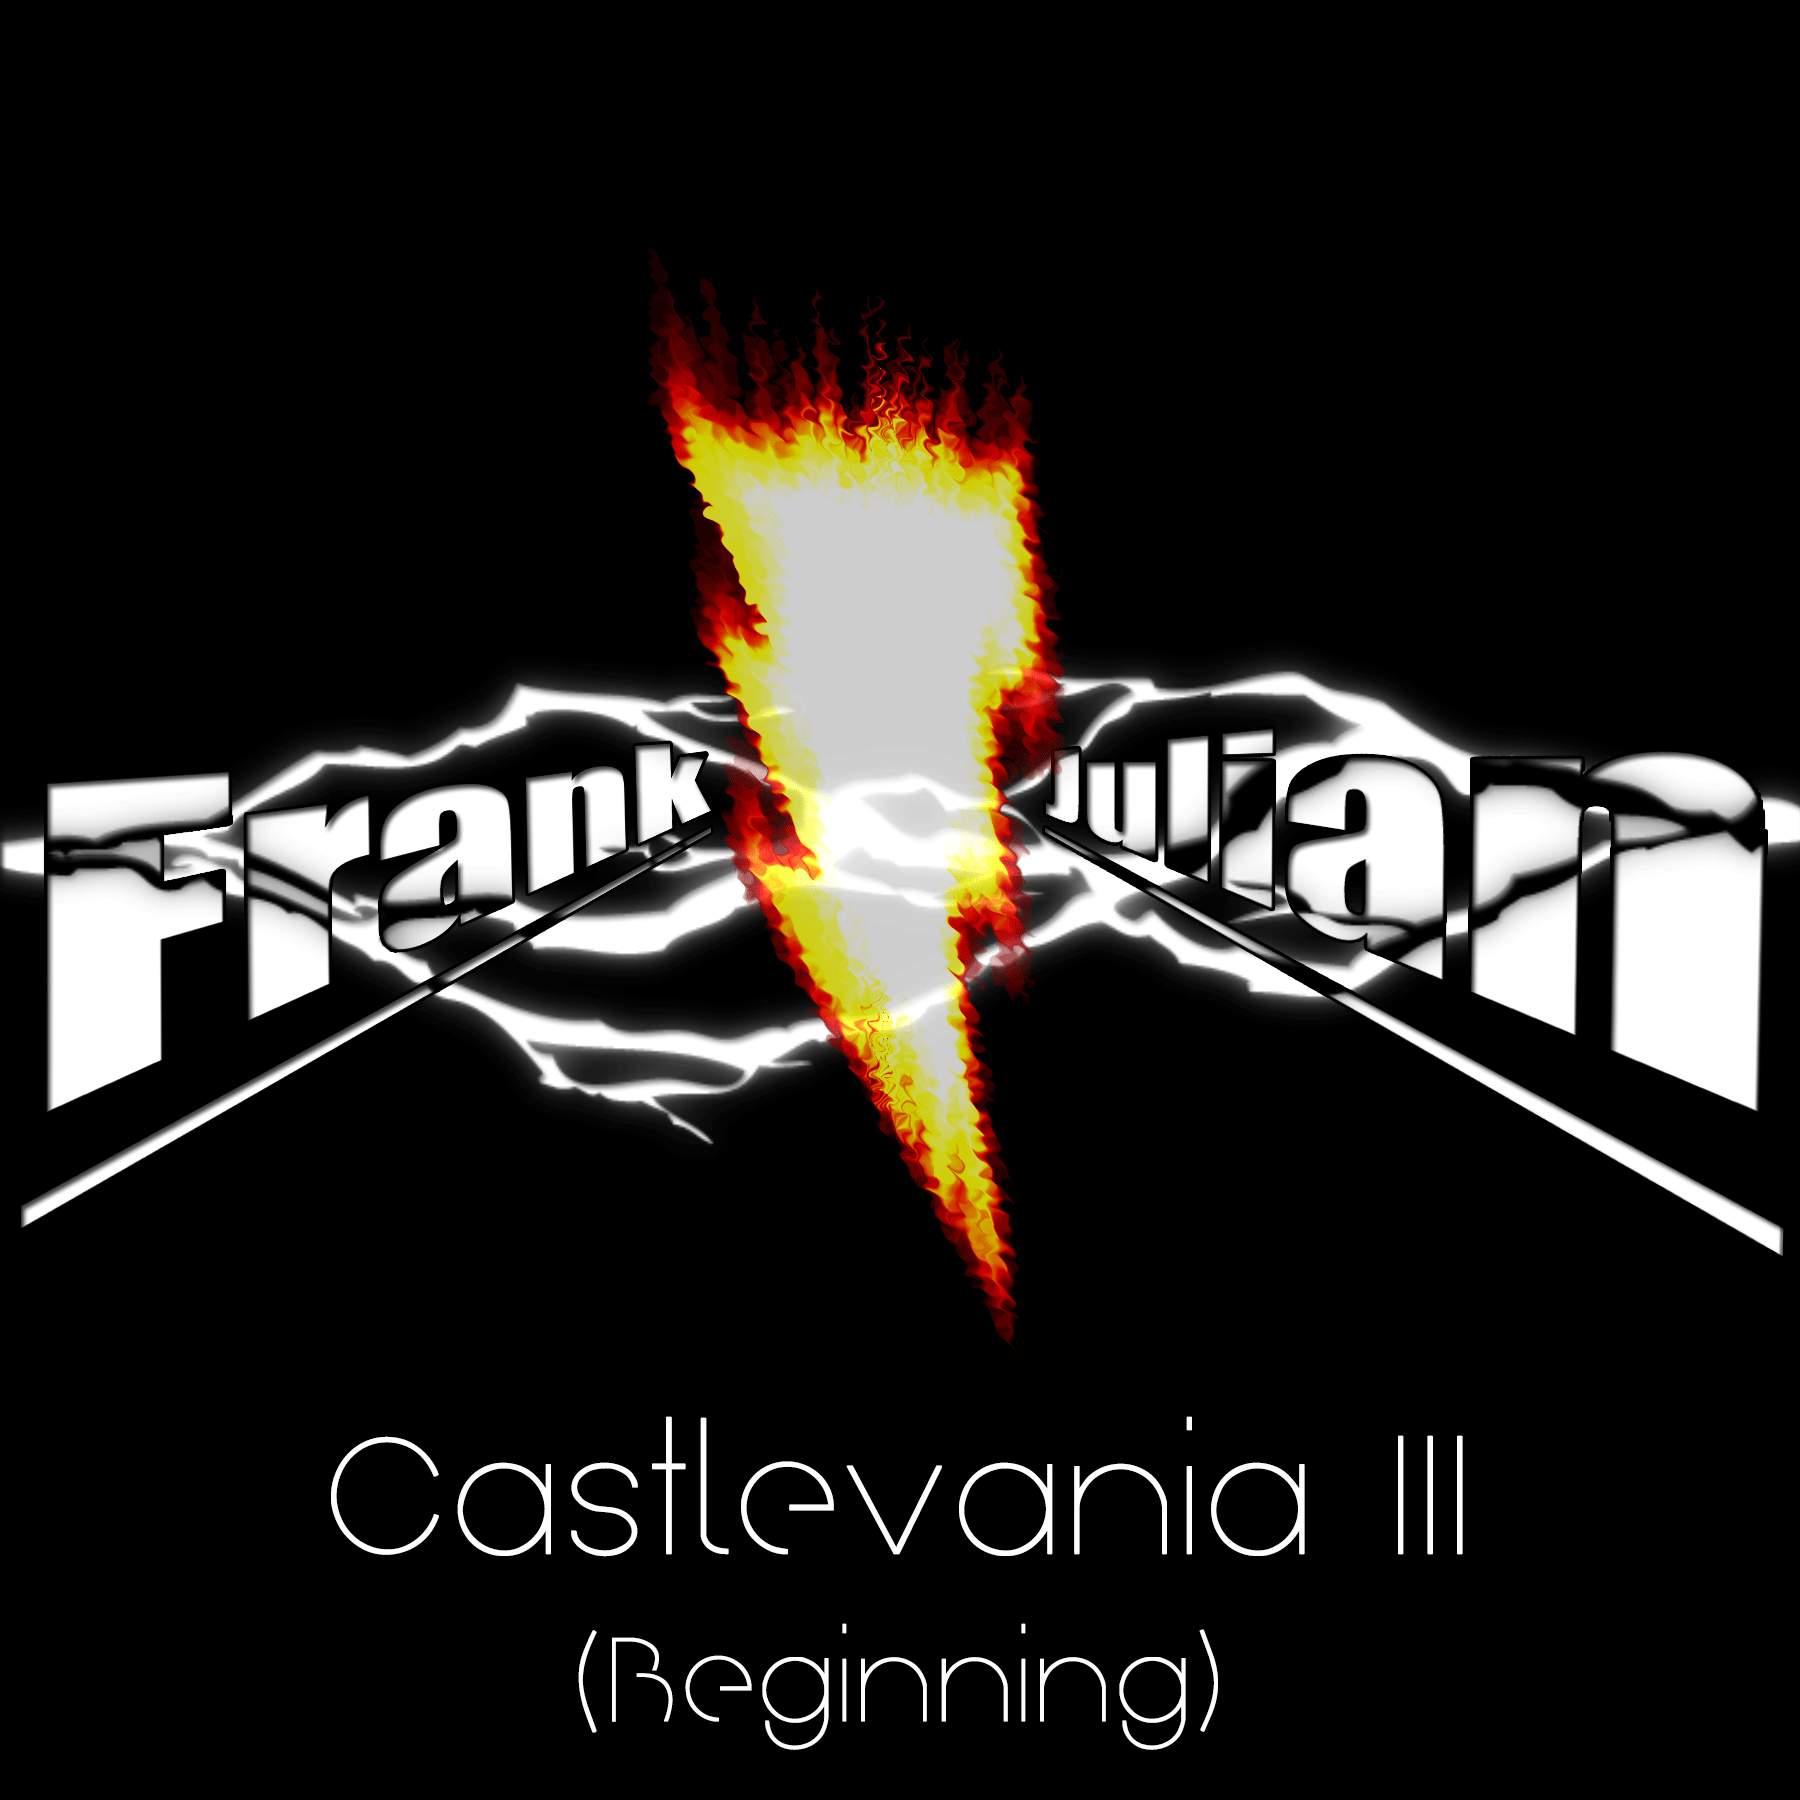 Julian, Frank: Frank Julian meets Castlevania III: Beginning (NES Main Theme Metal Cover)